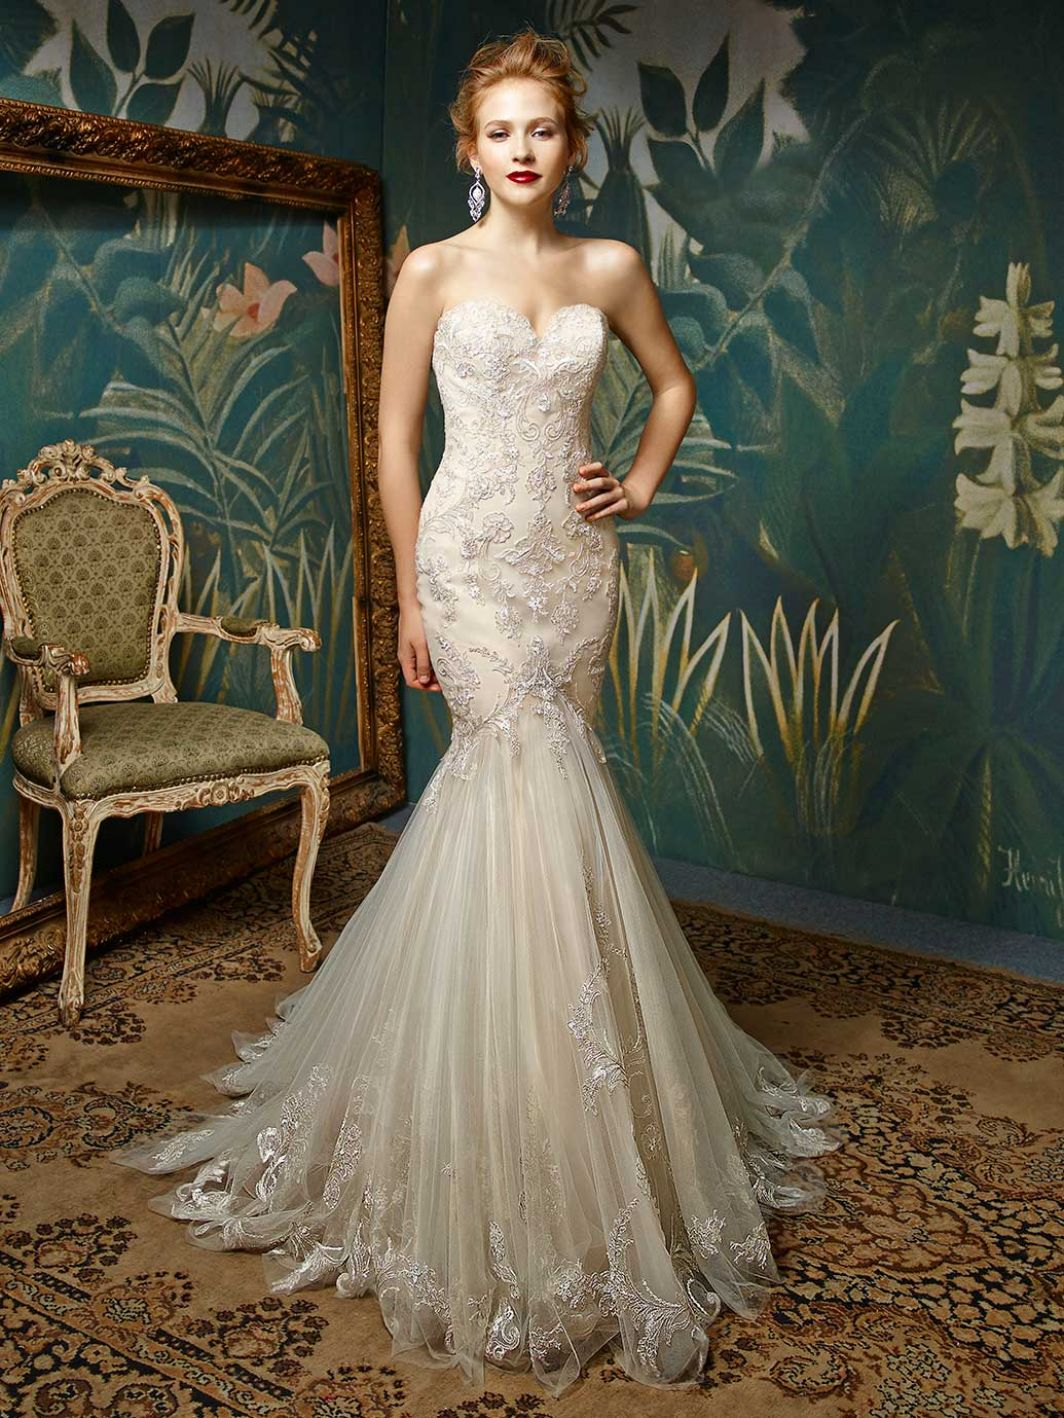 810535ef2e6b Bridal Gallery — Simply Stunning by Divas